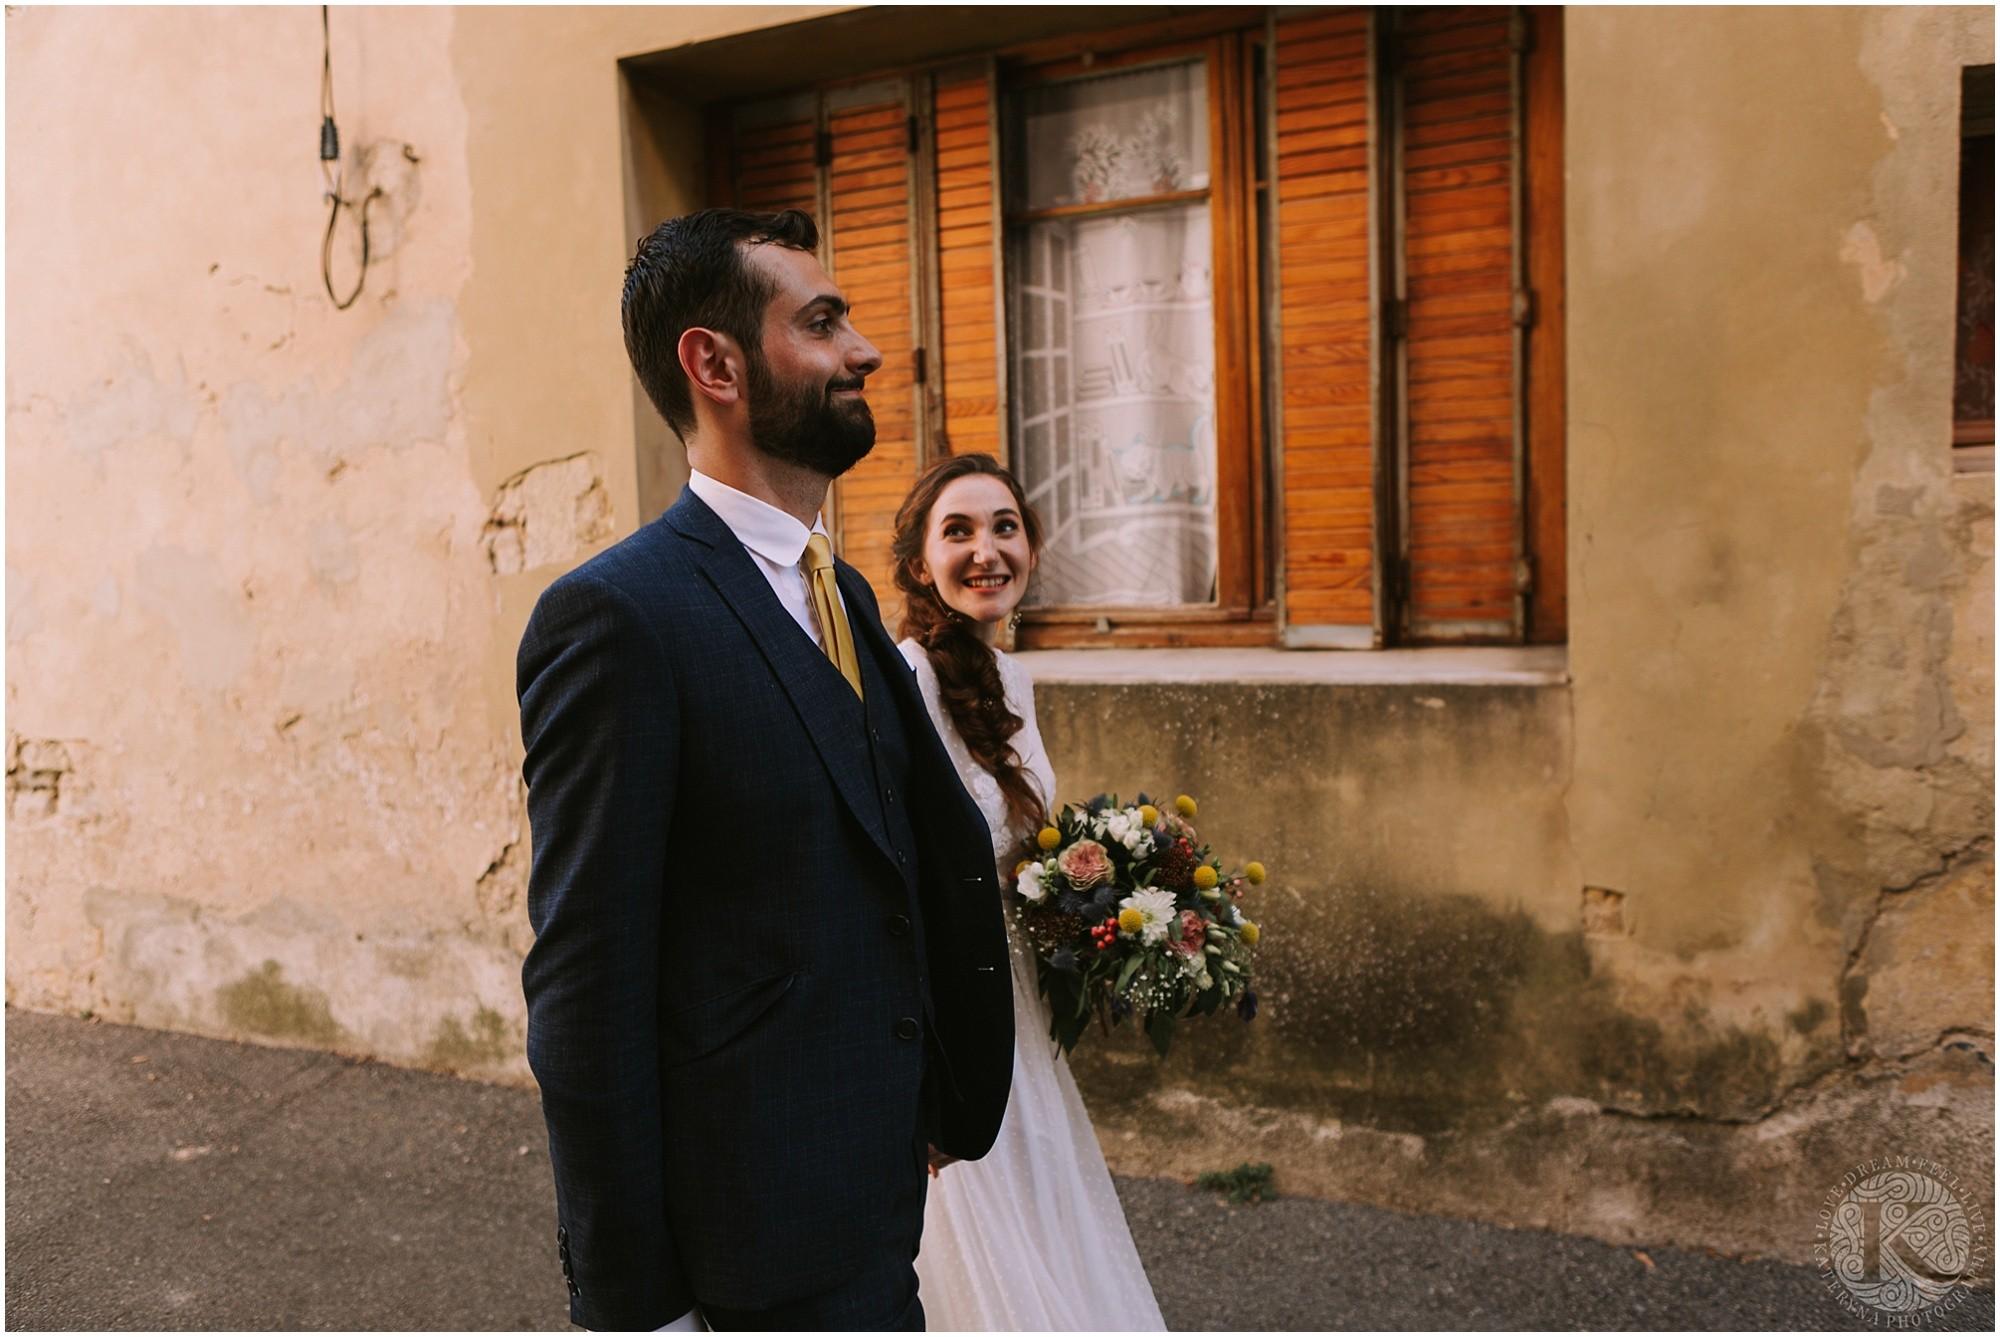 Kateryna-photos-photographe-mariage-vaucluse-provence-avignon-ferme-st-hugues_0051.jpg